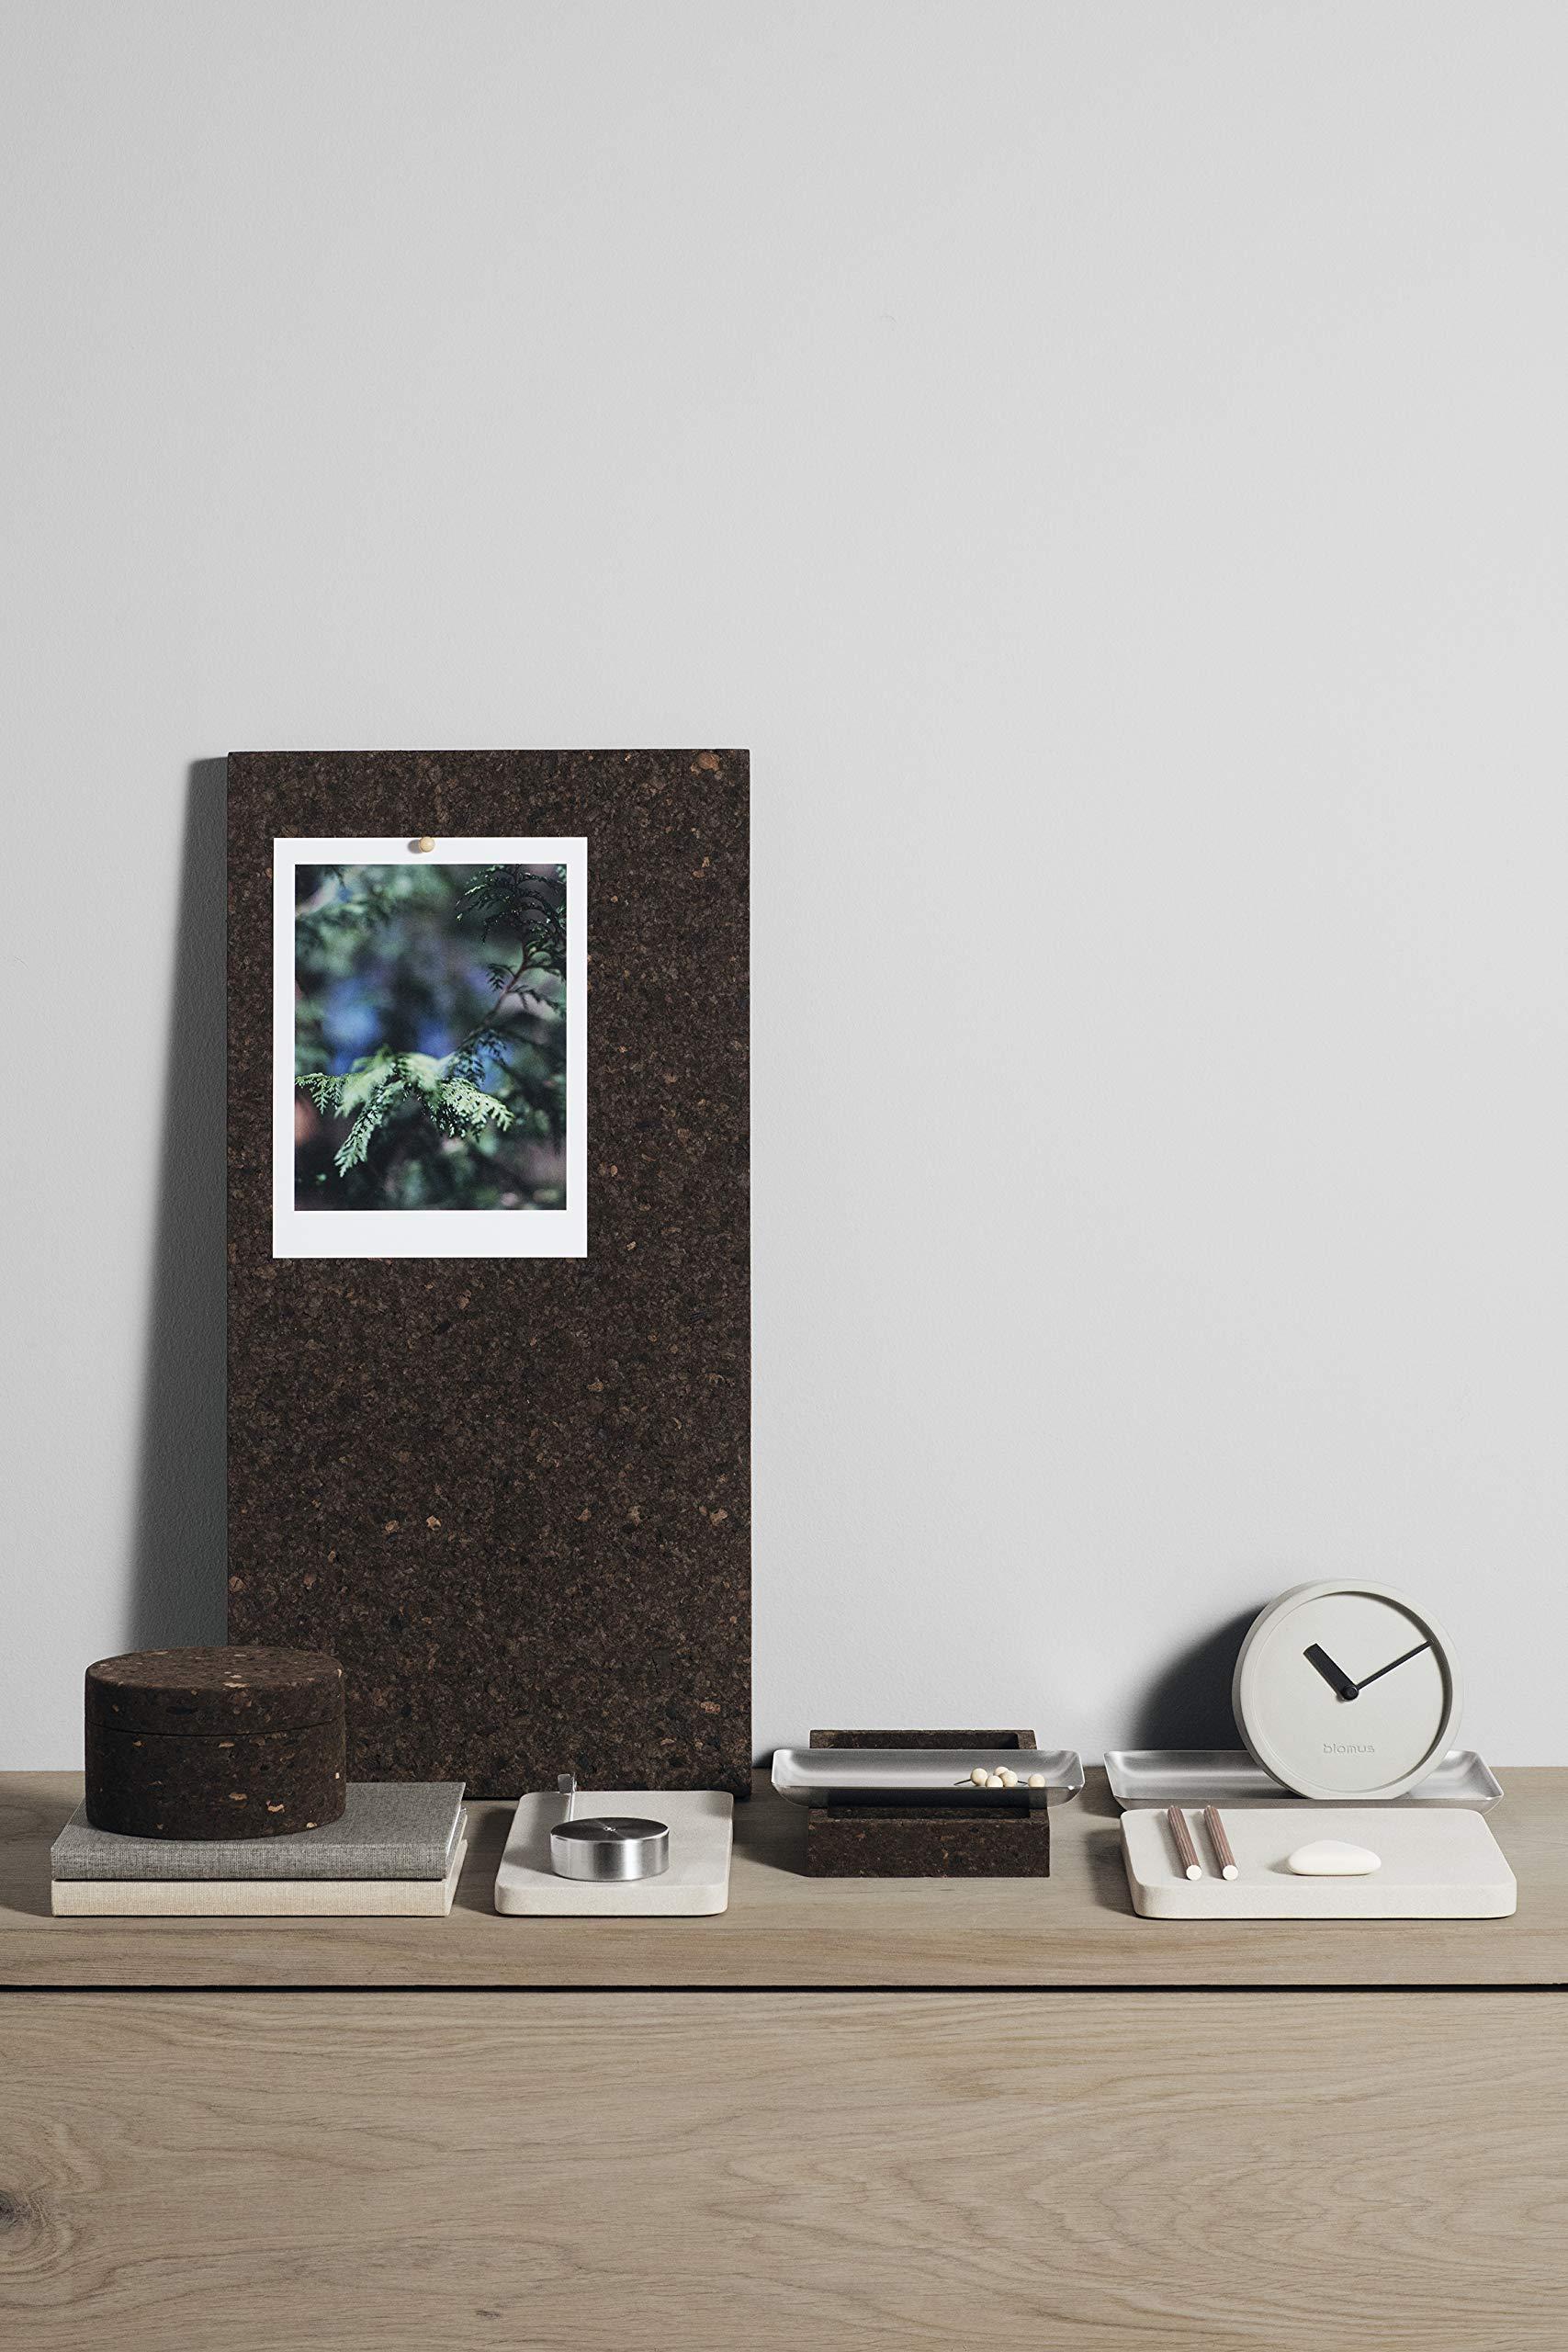 Blomus Fuado Smoked Cork Memo Notice Board (H x W x D) 30X60X2 cm